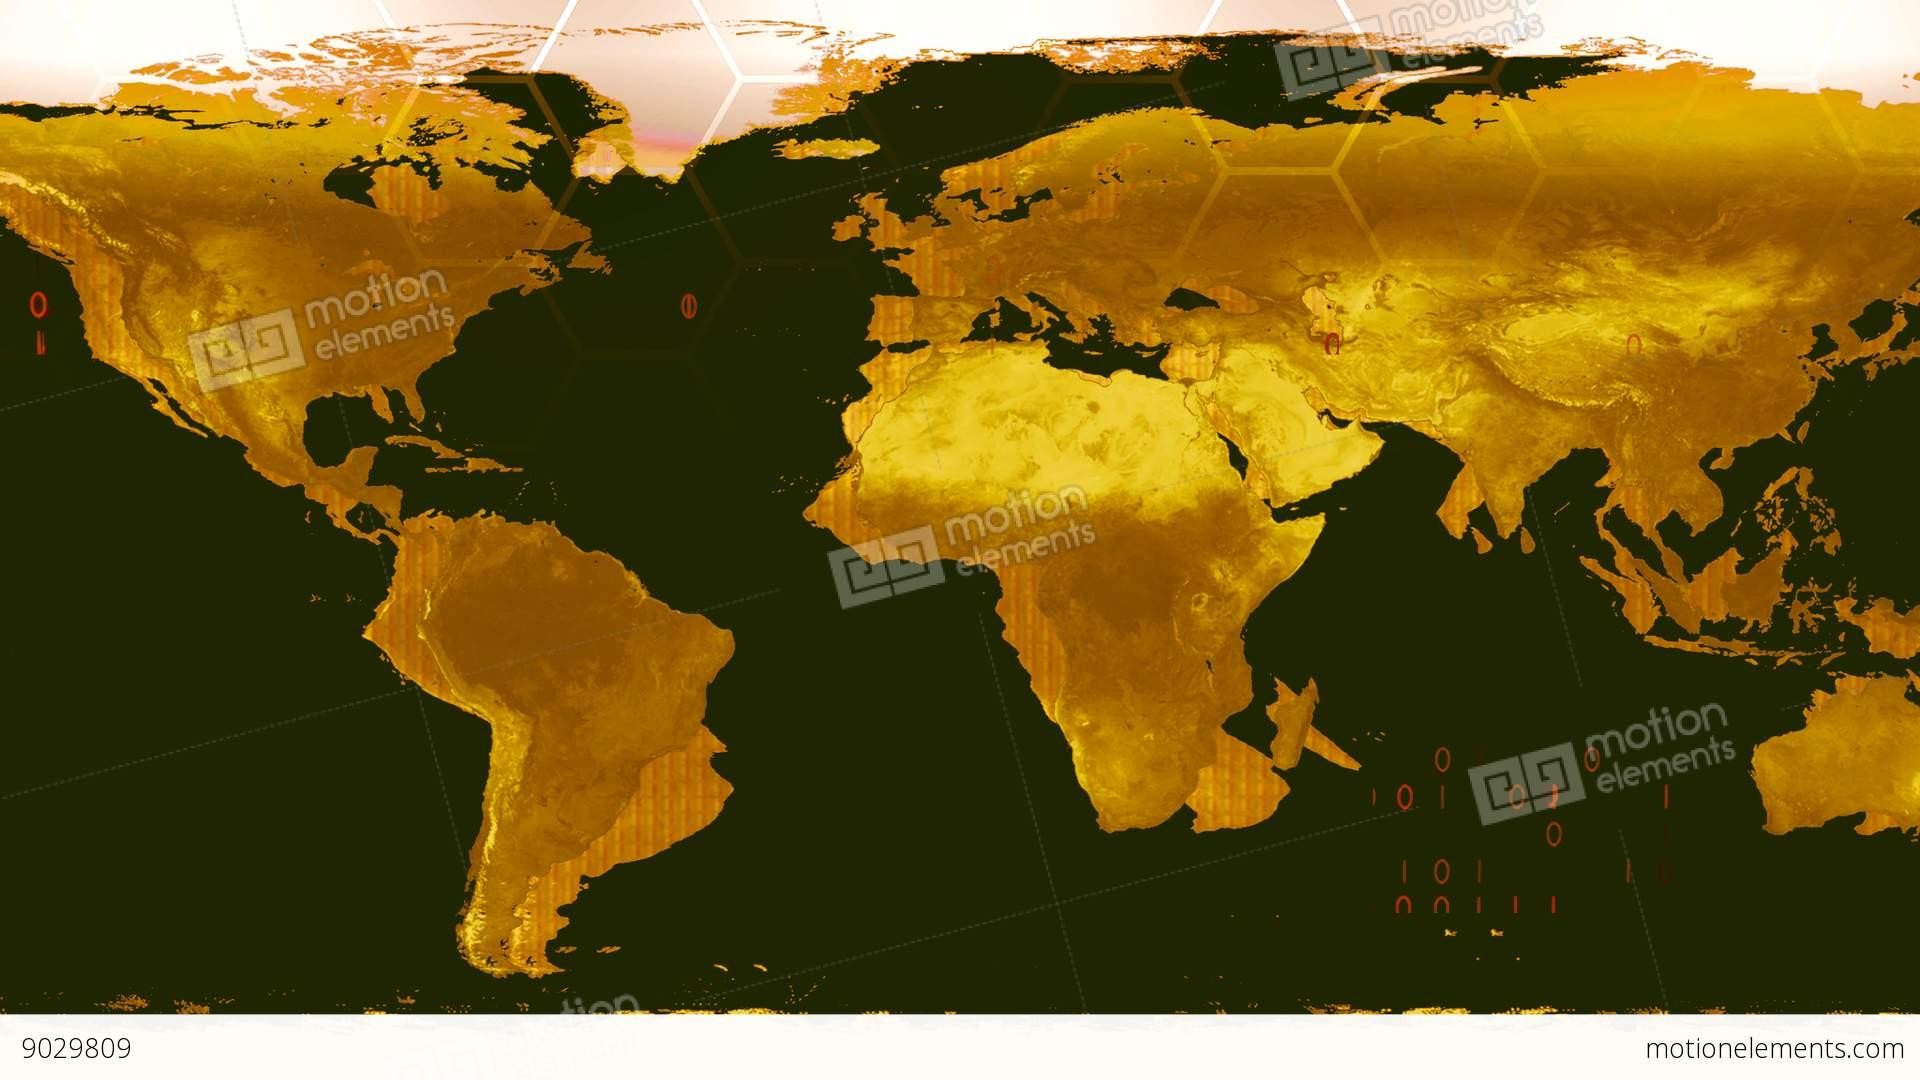 World Map High Tech Digital Satellite Data View War Room K Stock - World map satellite view video